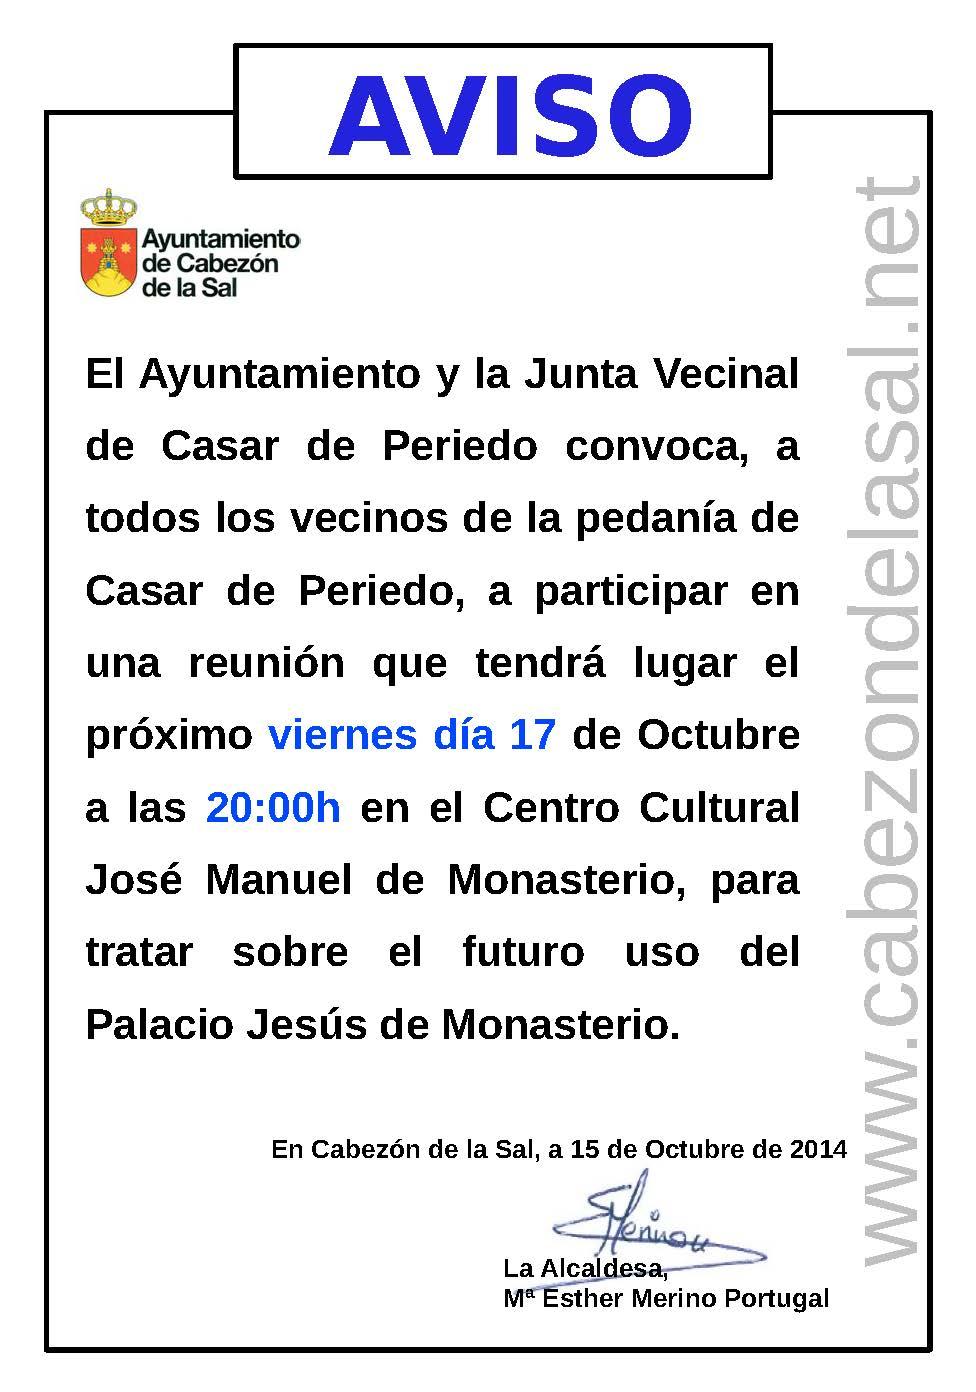 http://www.cabezondelasal.net/wp-content/uploads/2014/10/Aviso-Reuni%C3%B3n-palacio-jesus-de-monasterio1.jpg